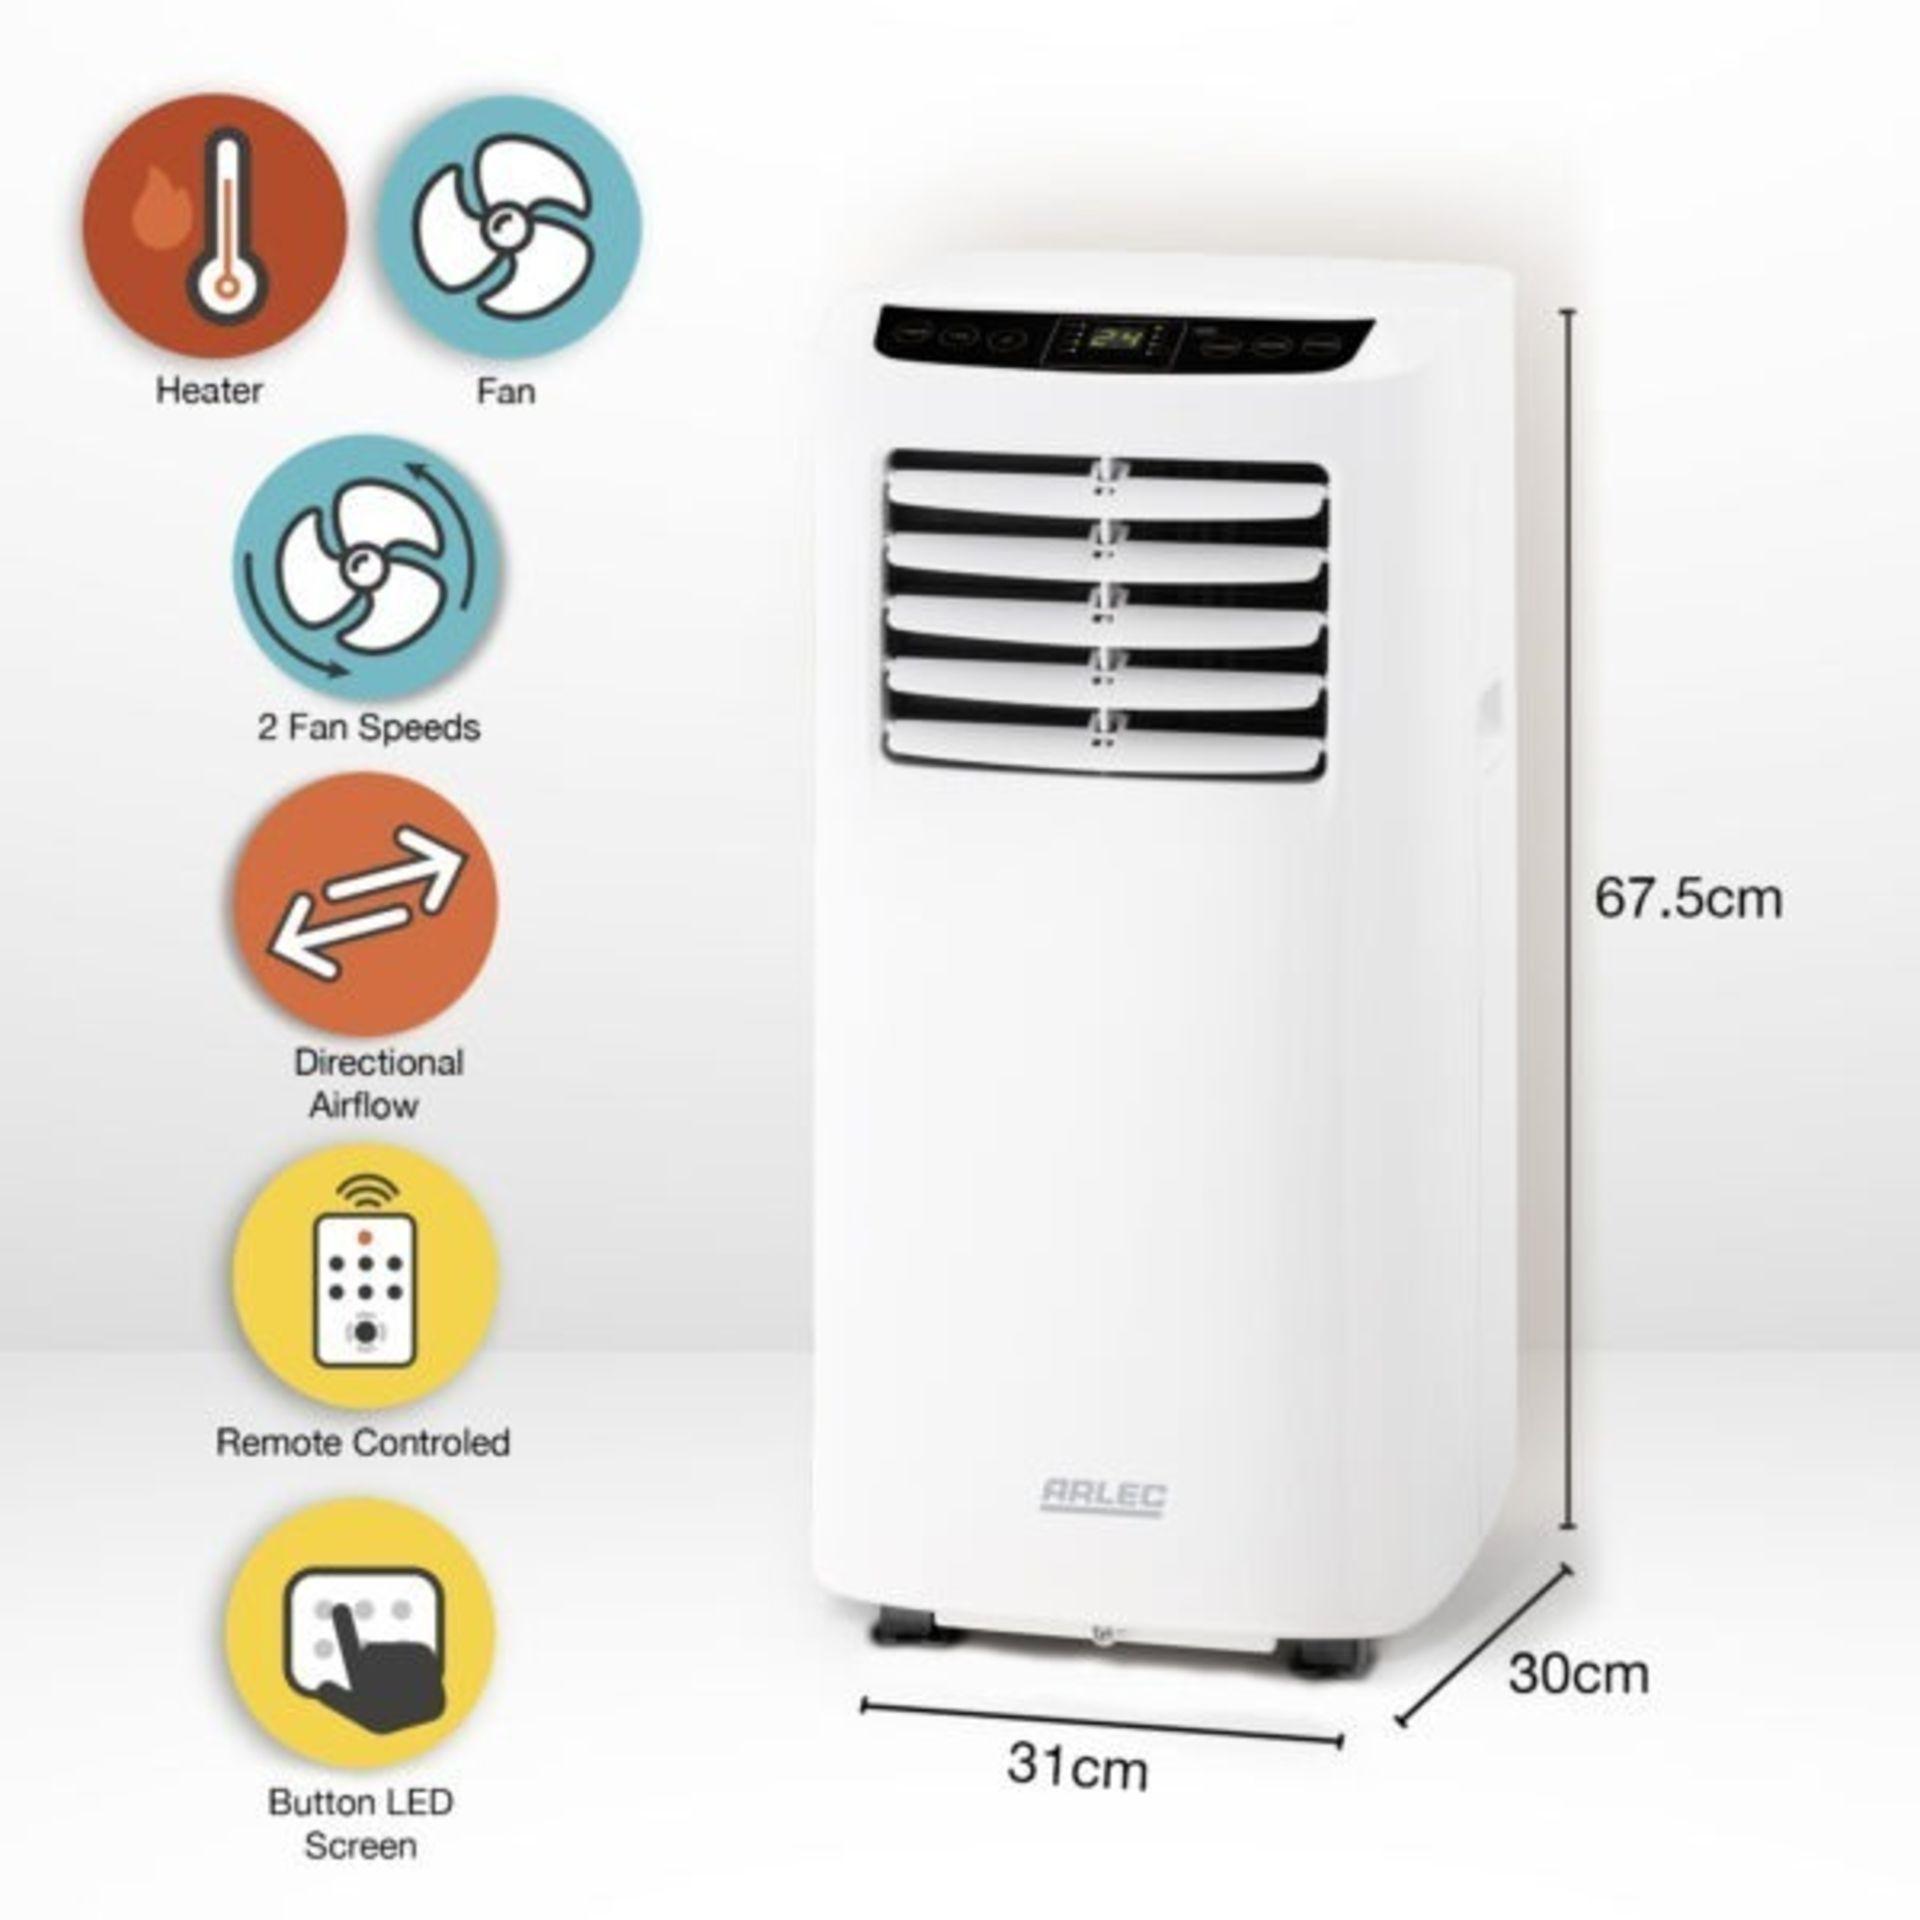 (P2) 1x Arlec Portable Air Conditioner 8000 BTU/h. RRP £400.00. - Image 2 of 3